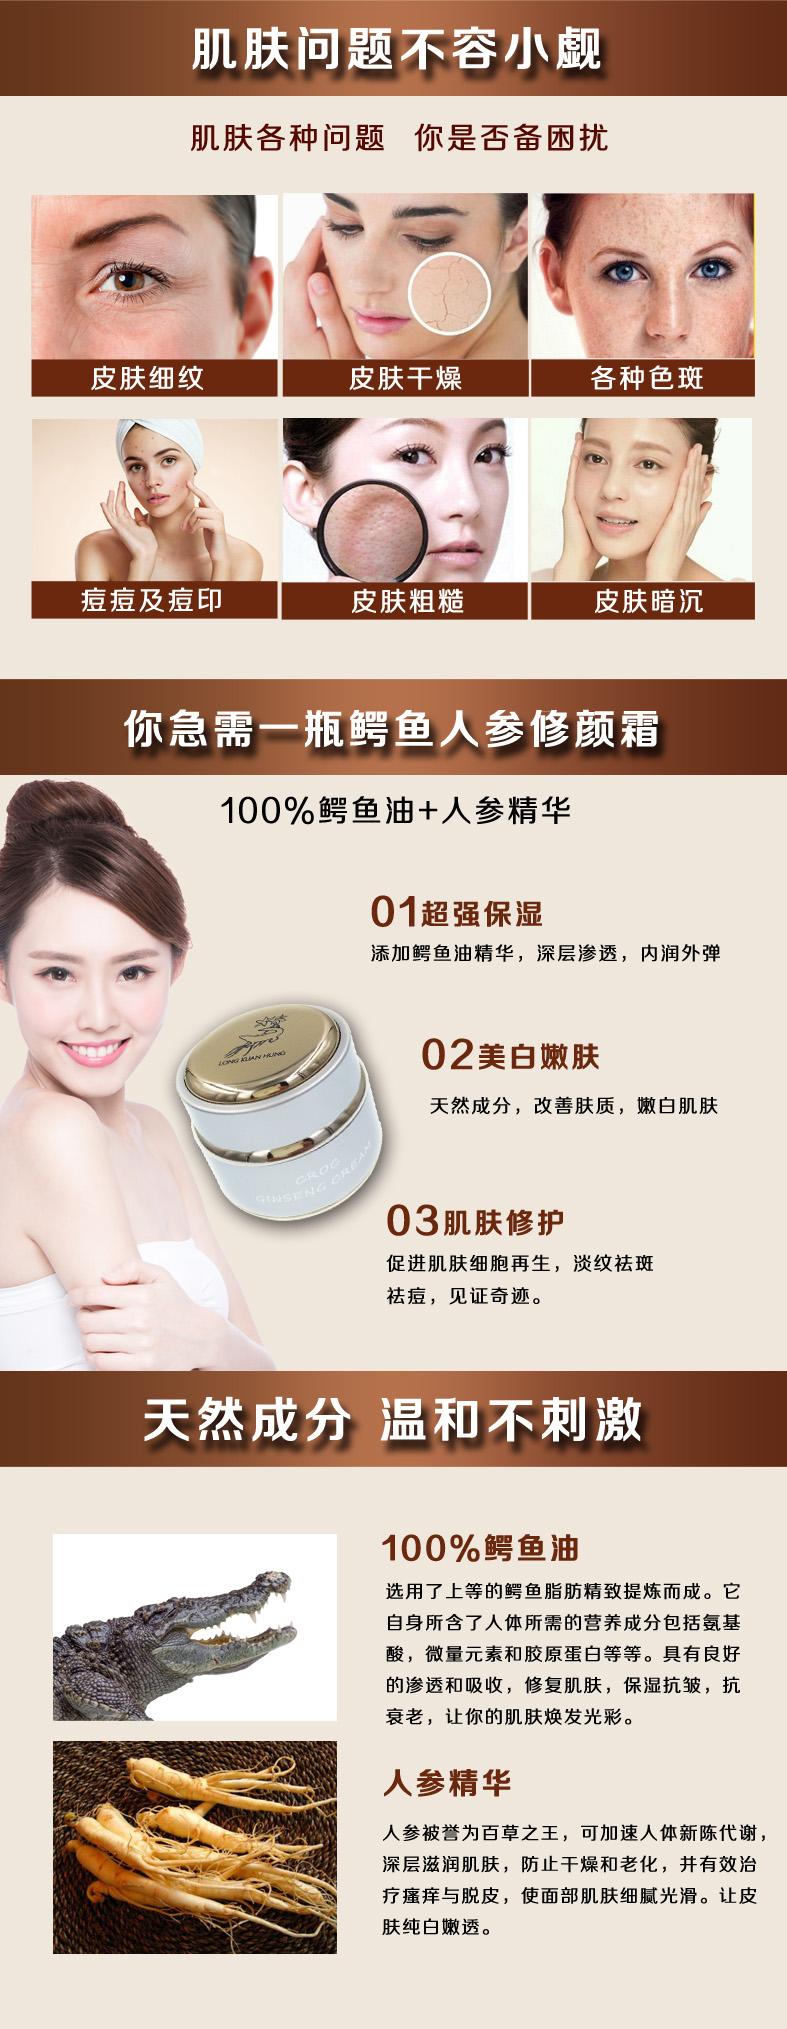 Long Kuan Hung Crocodile Ginseng Cream Description